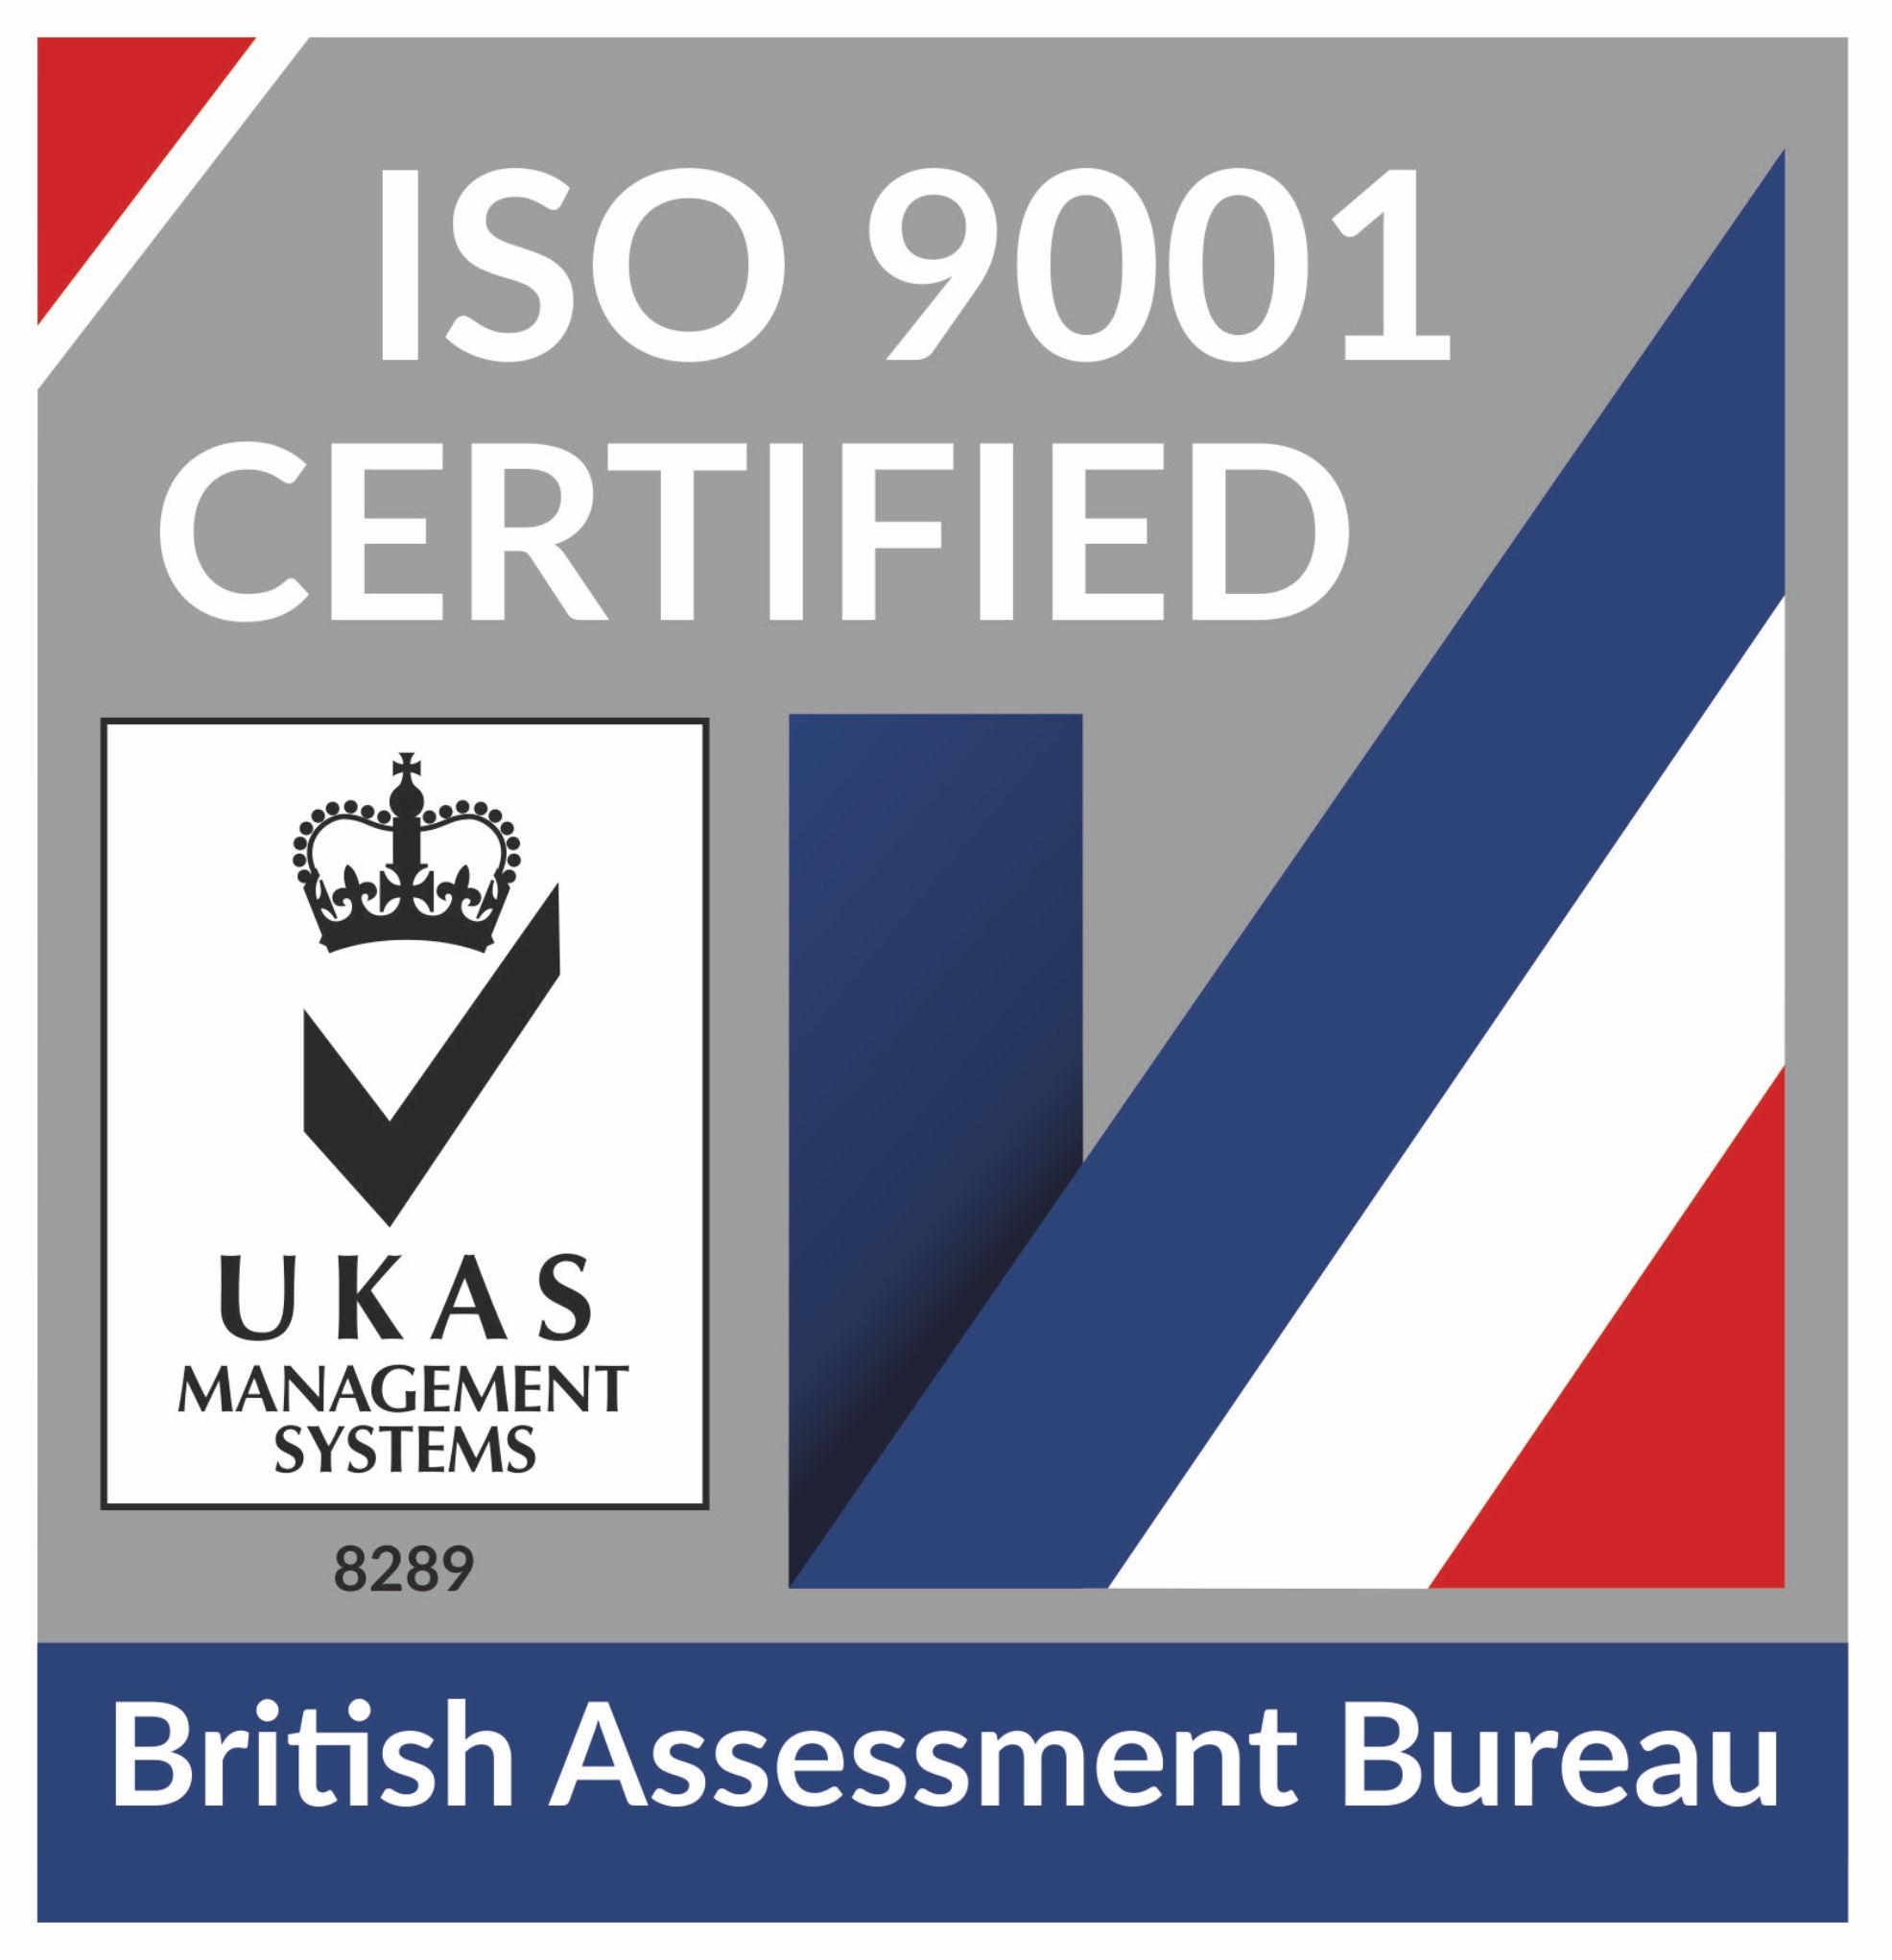 BAB UKAS-ISO-9001